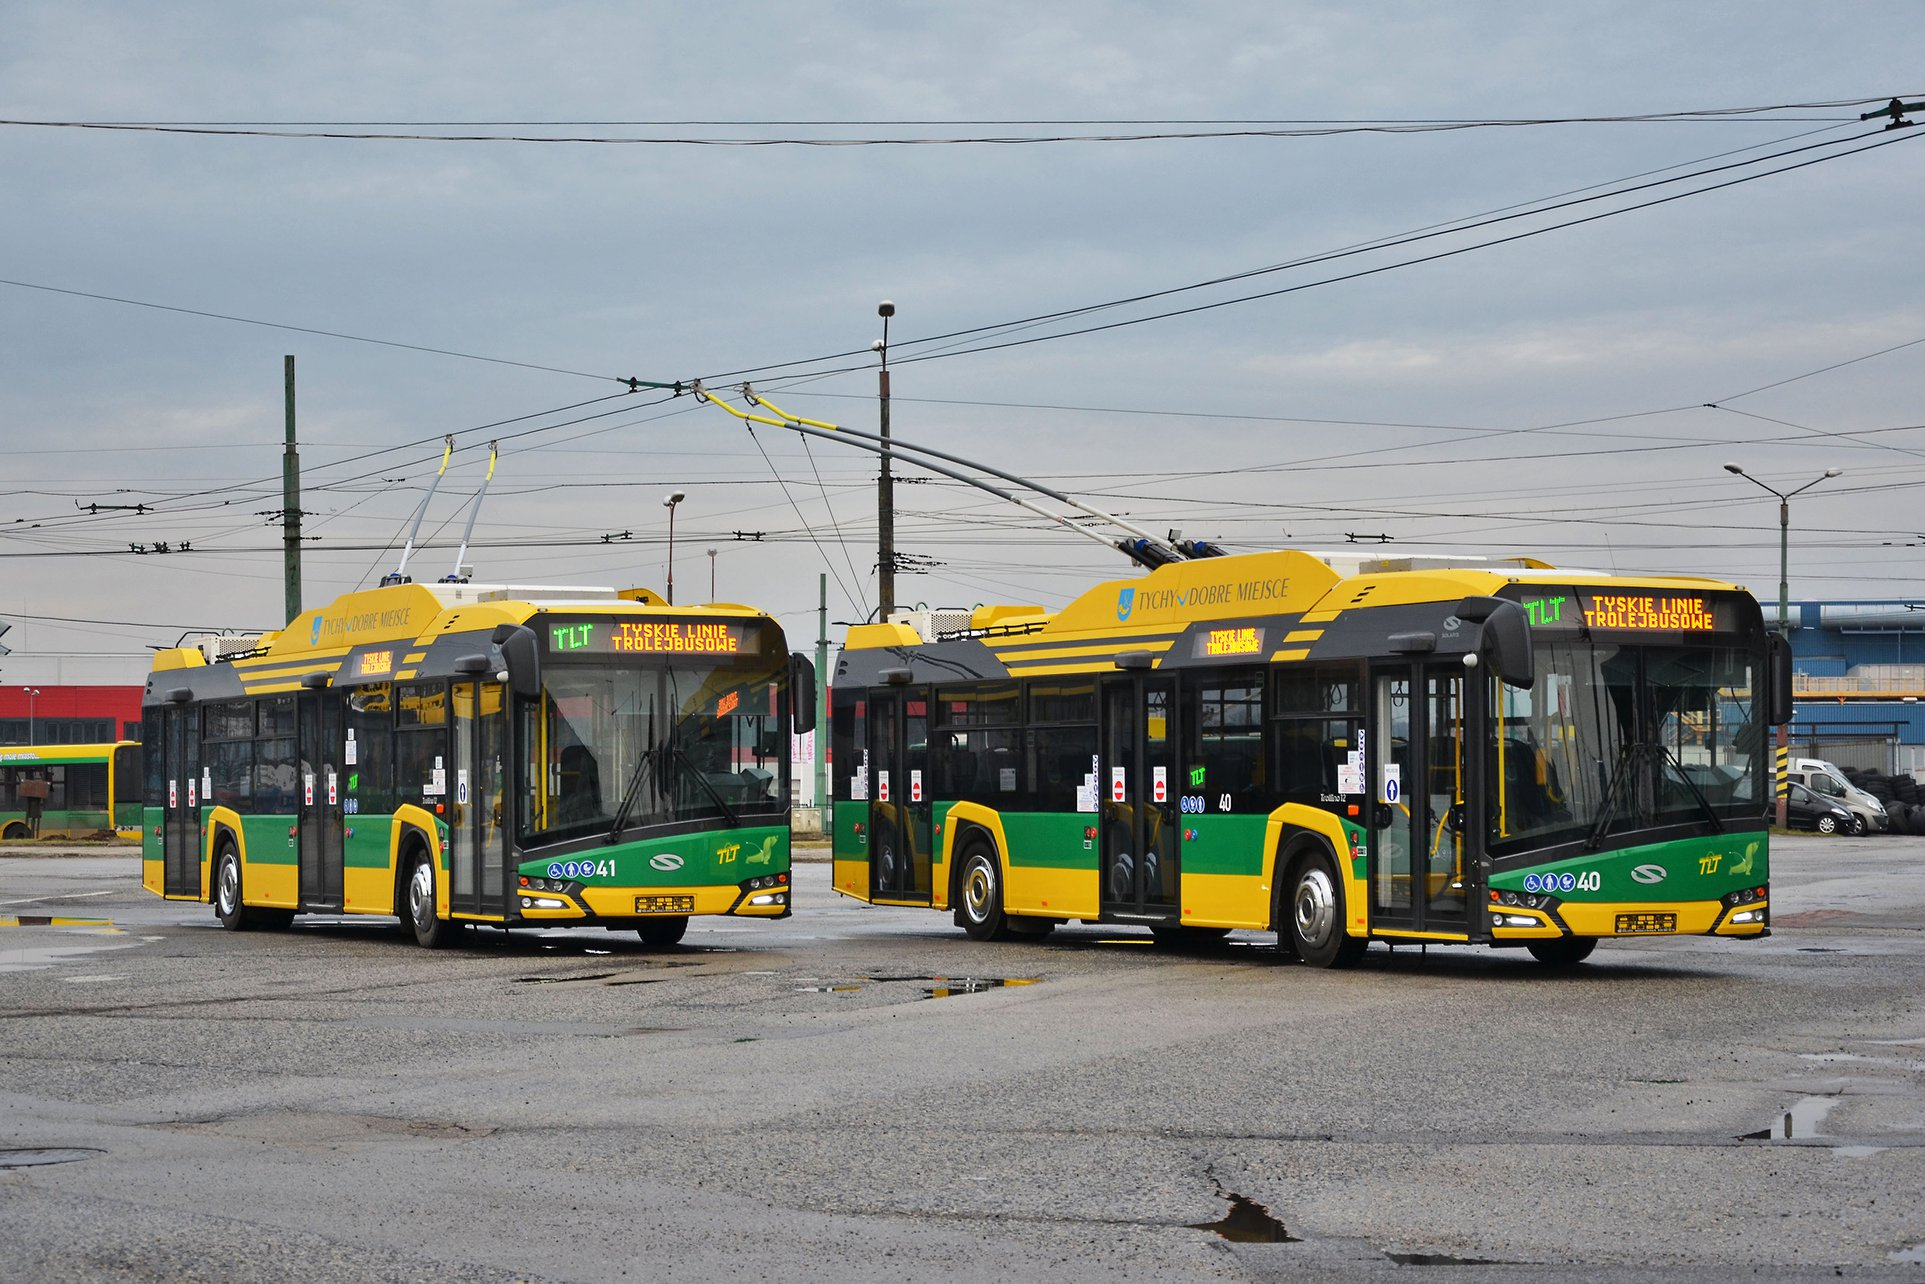 Dvojice nových trolejbusů je řešena jako tzv. parciální trolejbusy. (foto: Tyskie Linie Trolejbusowe)